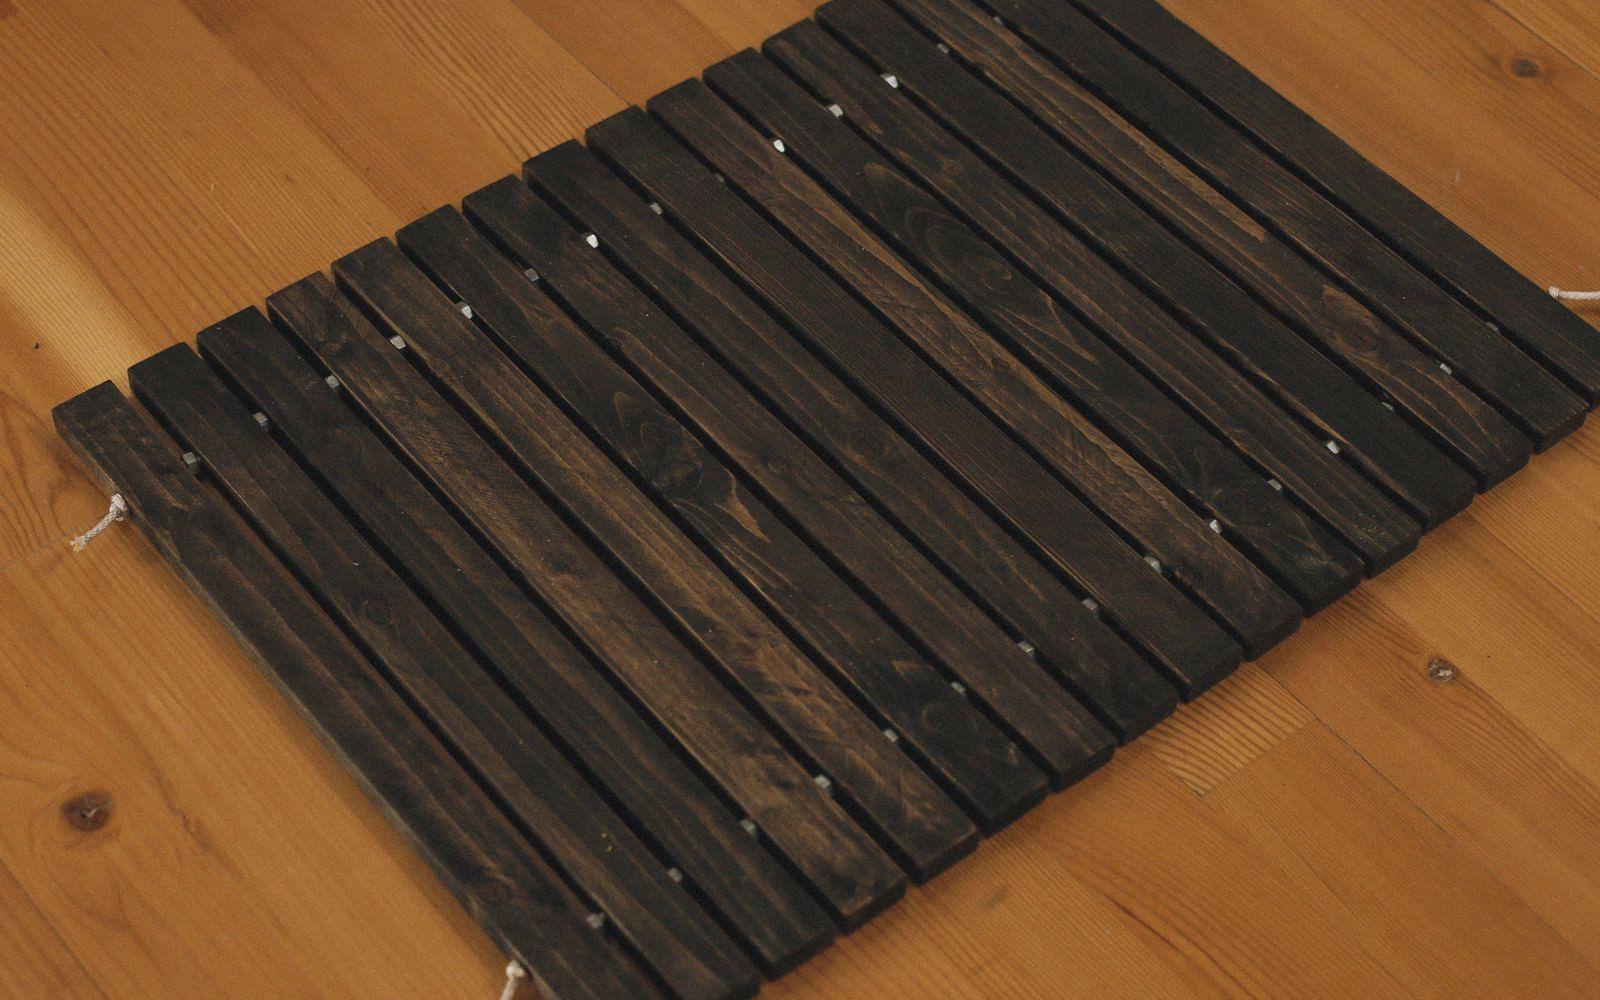 How To Make A Diy Wood Stake Door Mat Diy Wood Floors Wood Stake Wood Diy